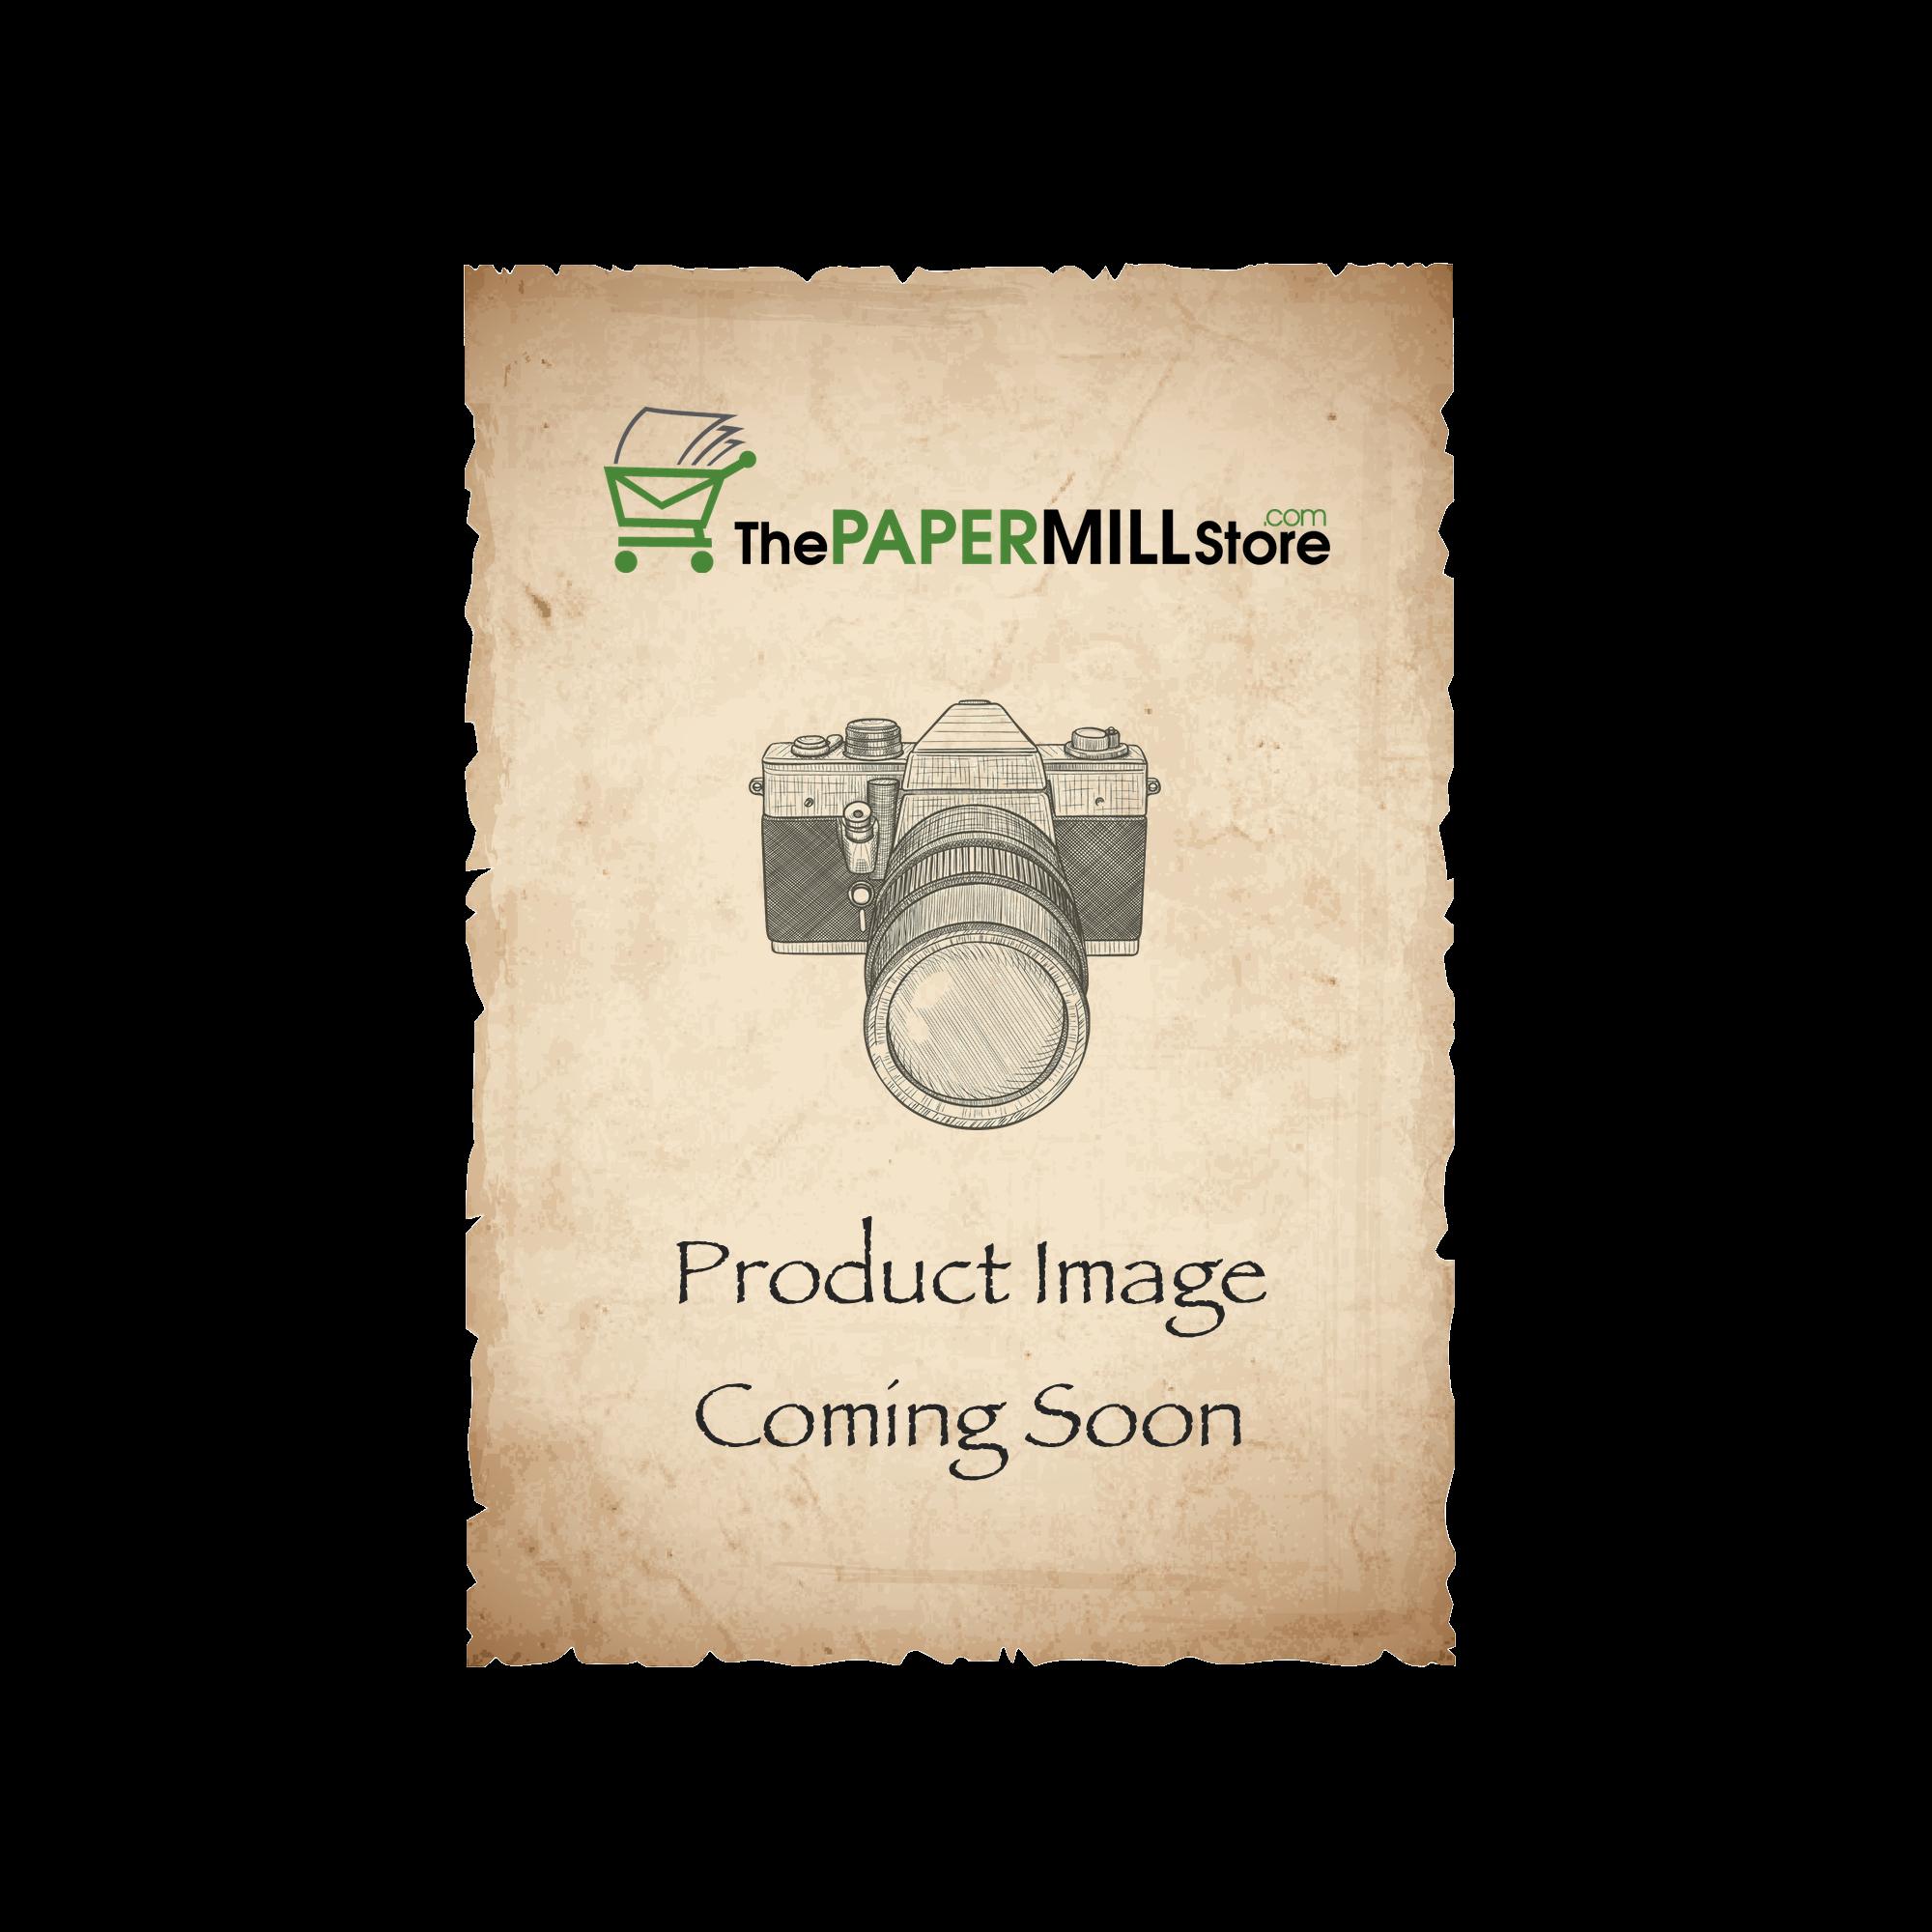 Loop Antique Vellum Cypress Card Stock - 23 x 35 in 80 lb Cover Antique Vellum  50% Recycled 500 per Carton